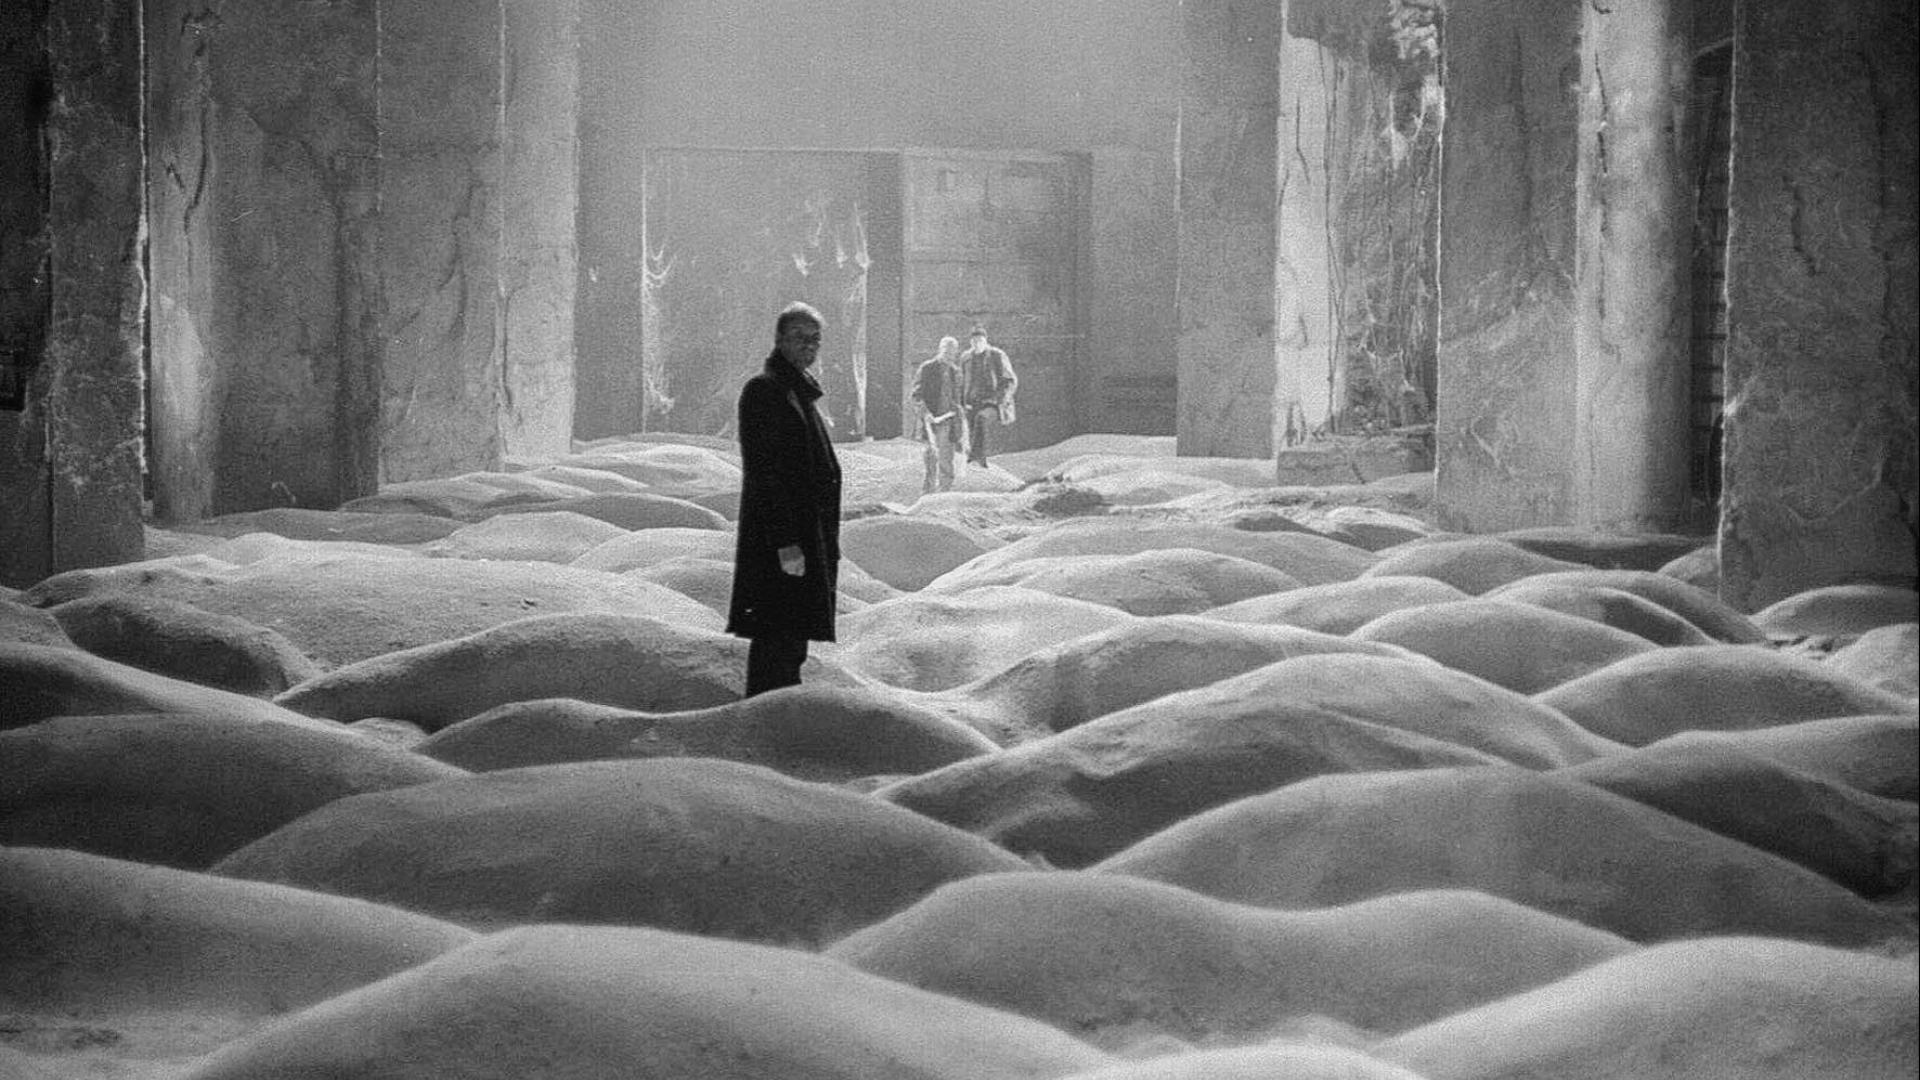 1979 andrei tarkovsky stalker movie grayscale 1920x1080 89133